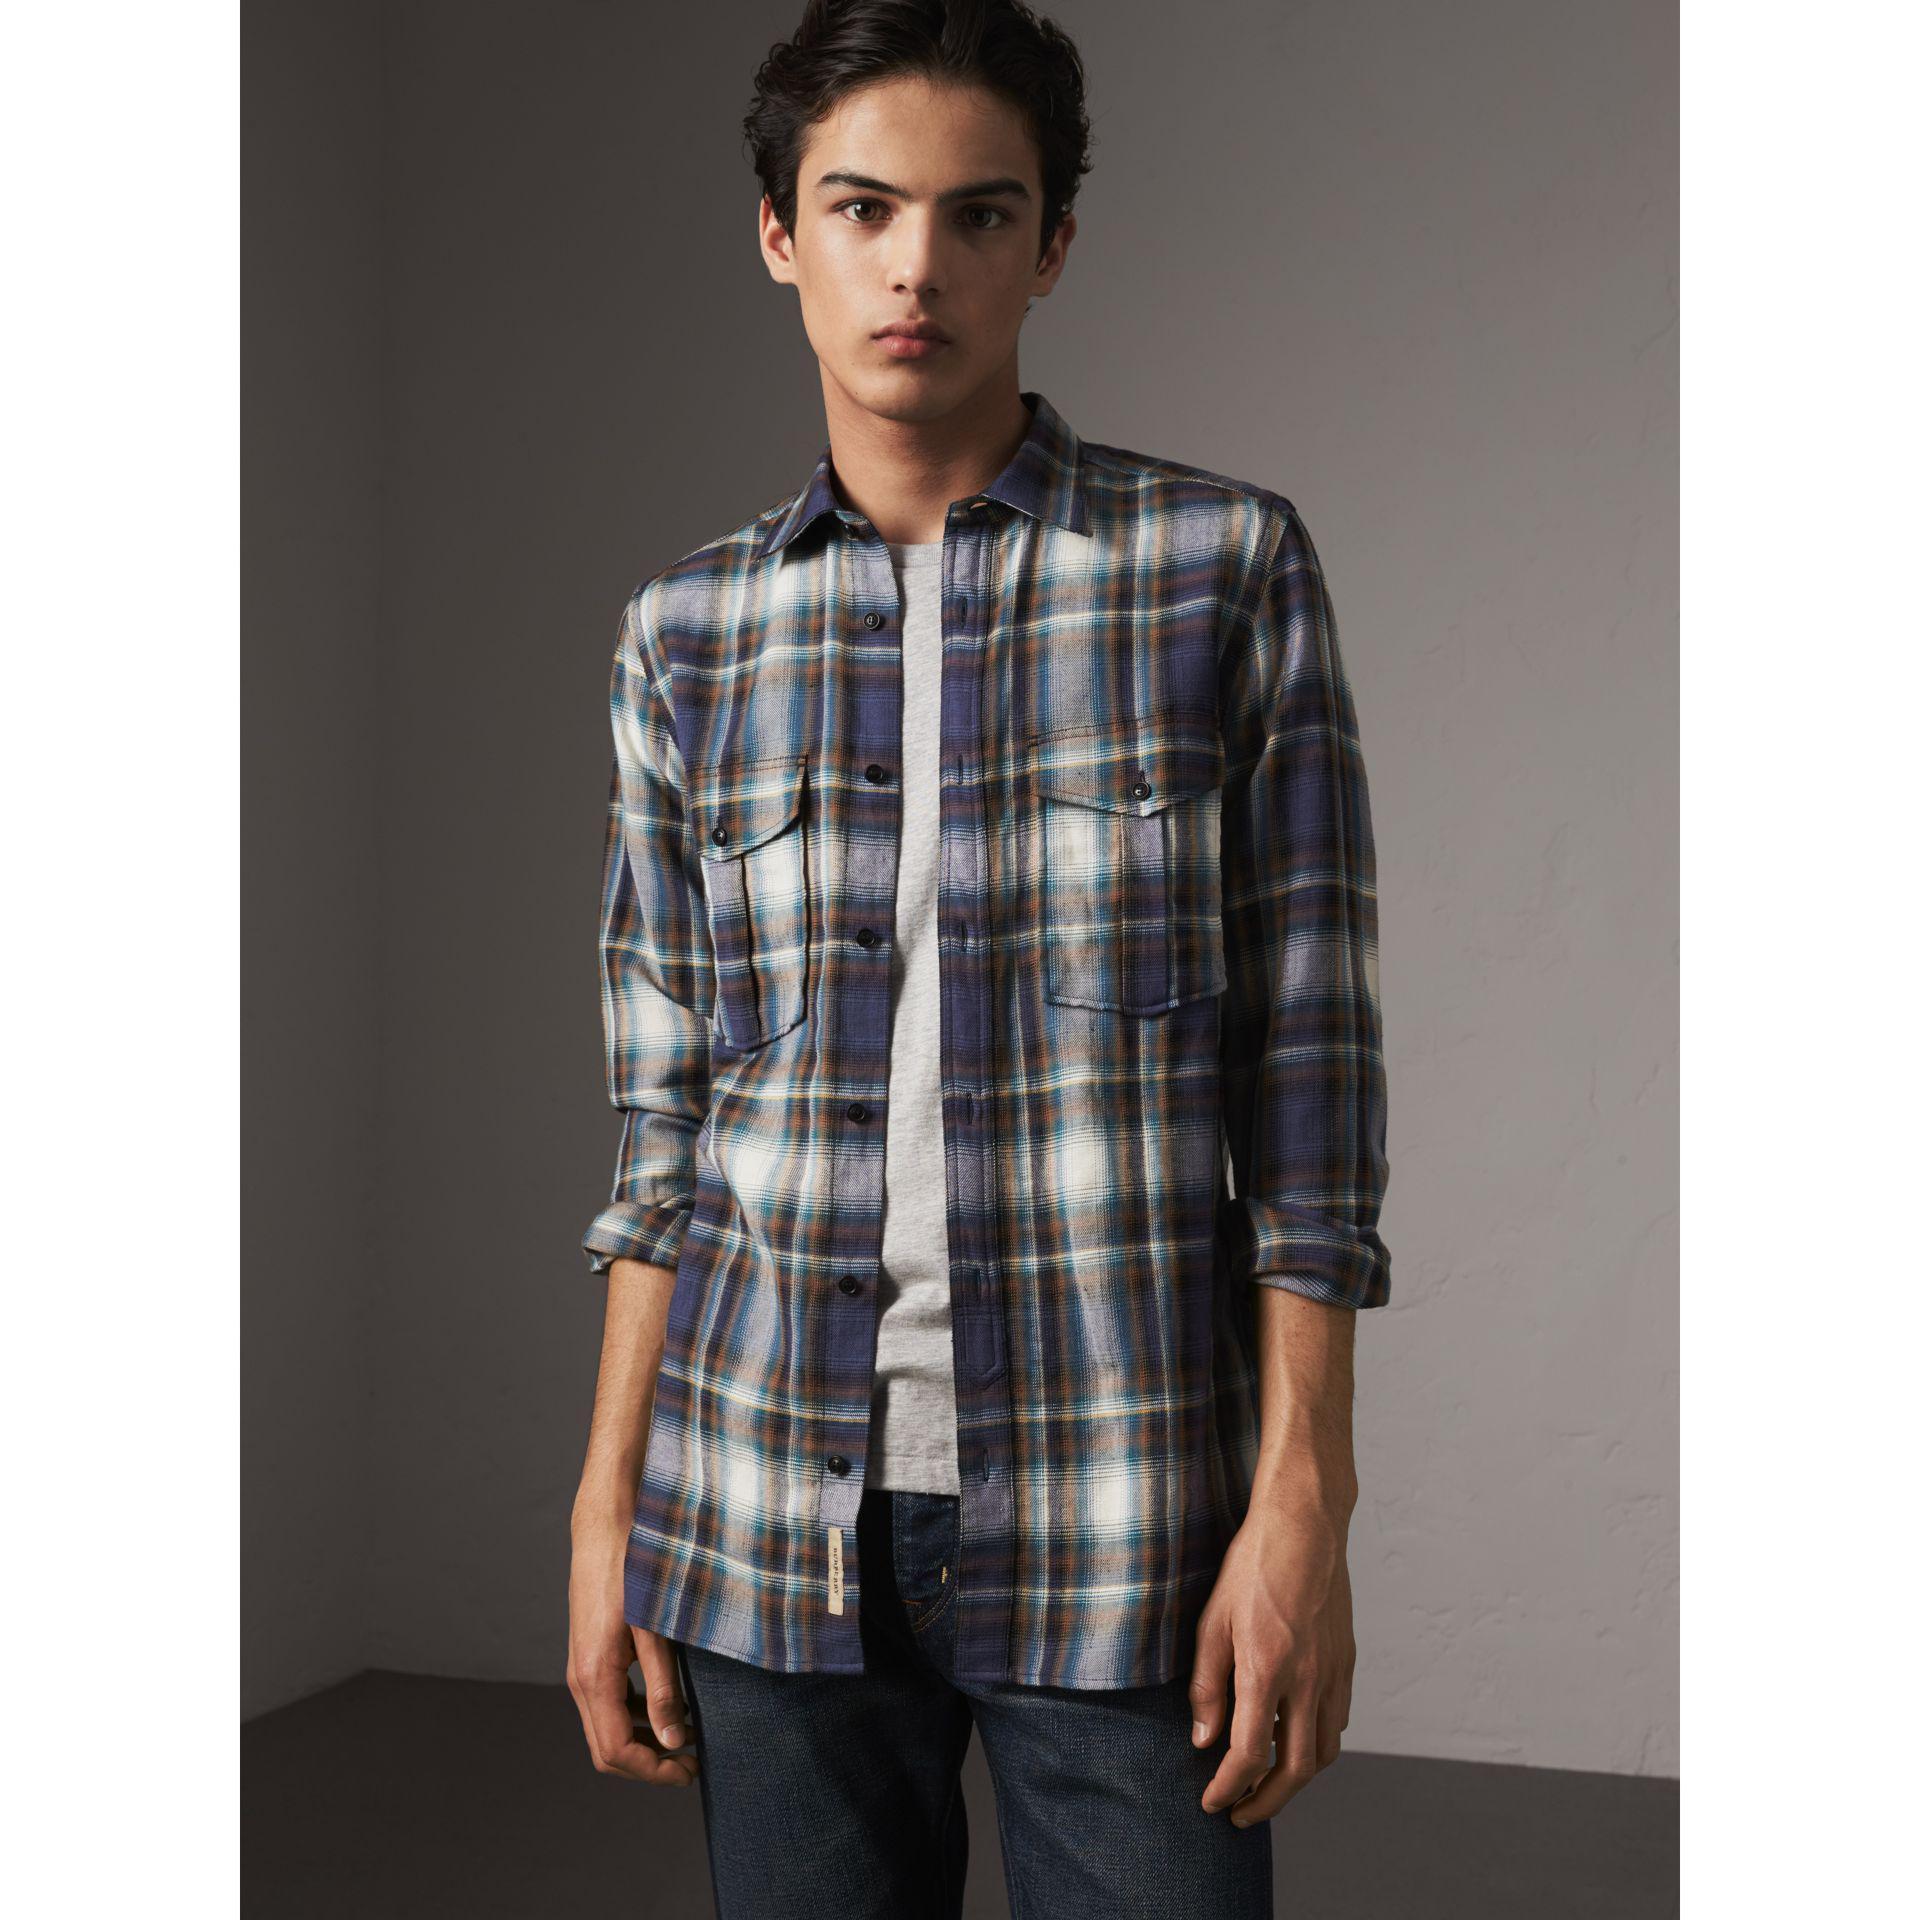 91e8442d Lyst - Burberry Check Wool Linen Cotton Flannel Shirt in Blue for Men